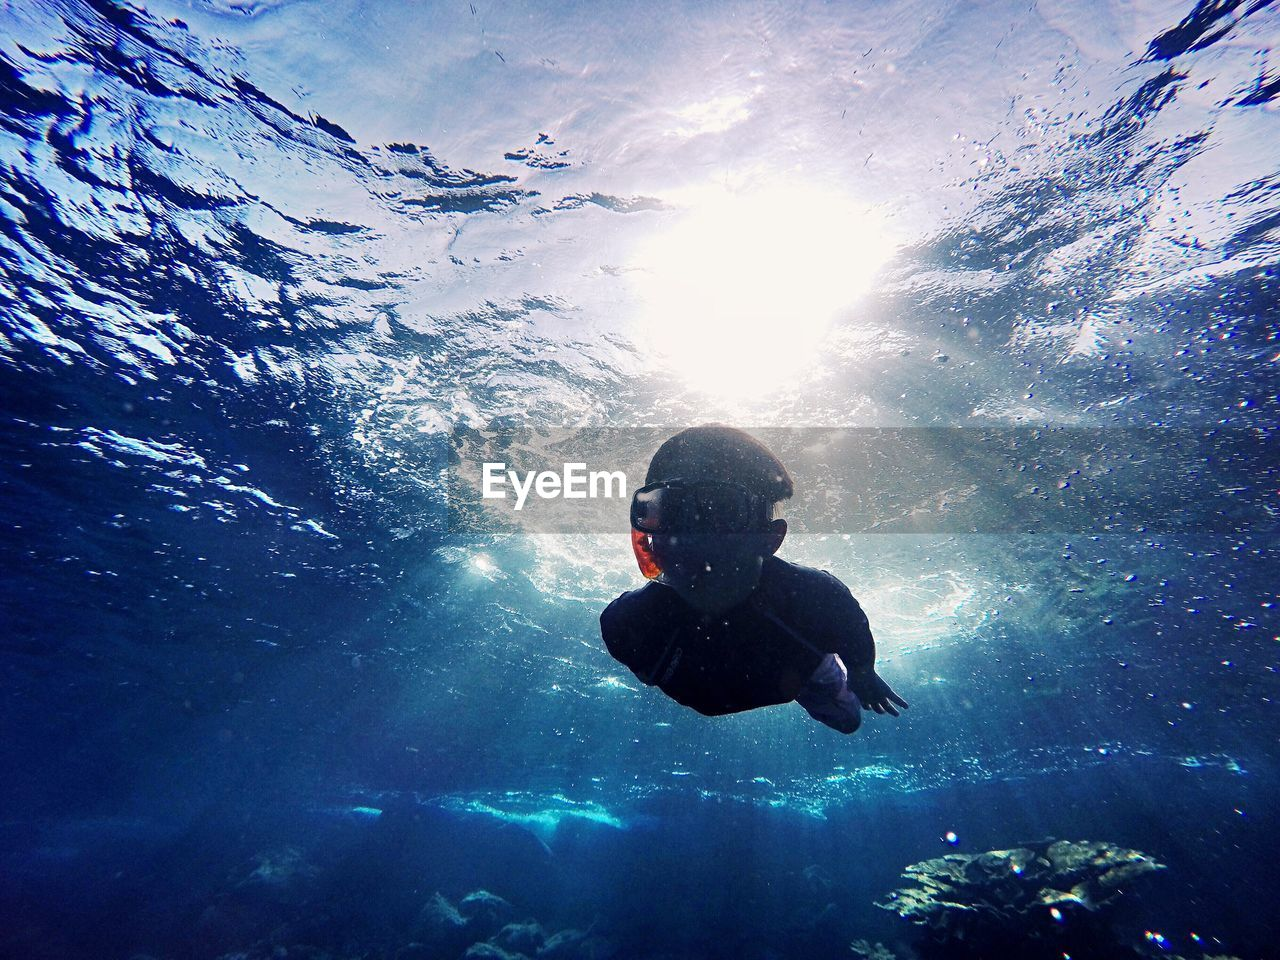 Boy Swimming In Water